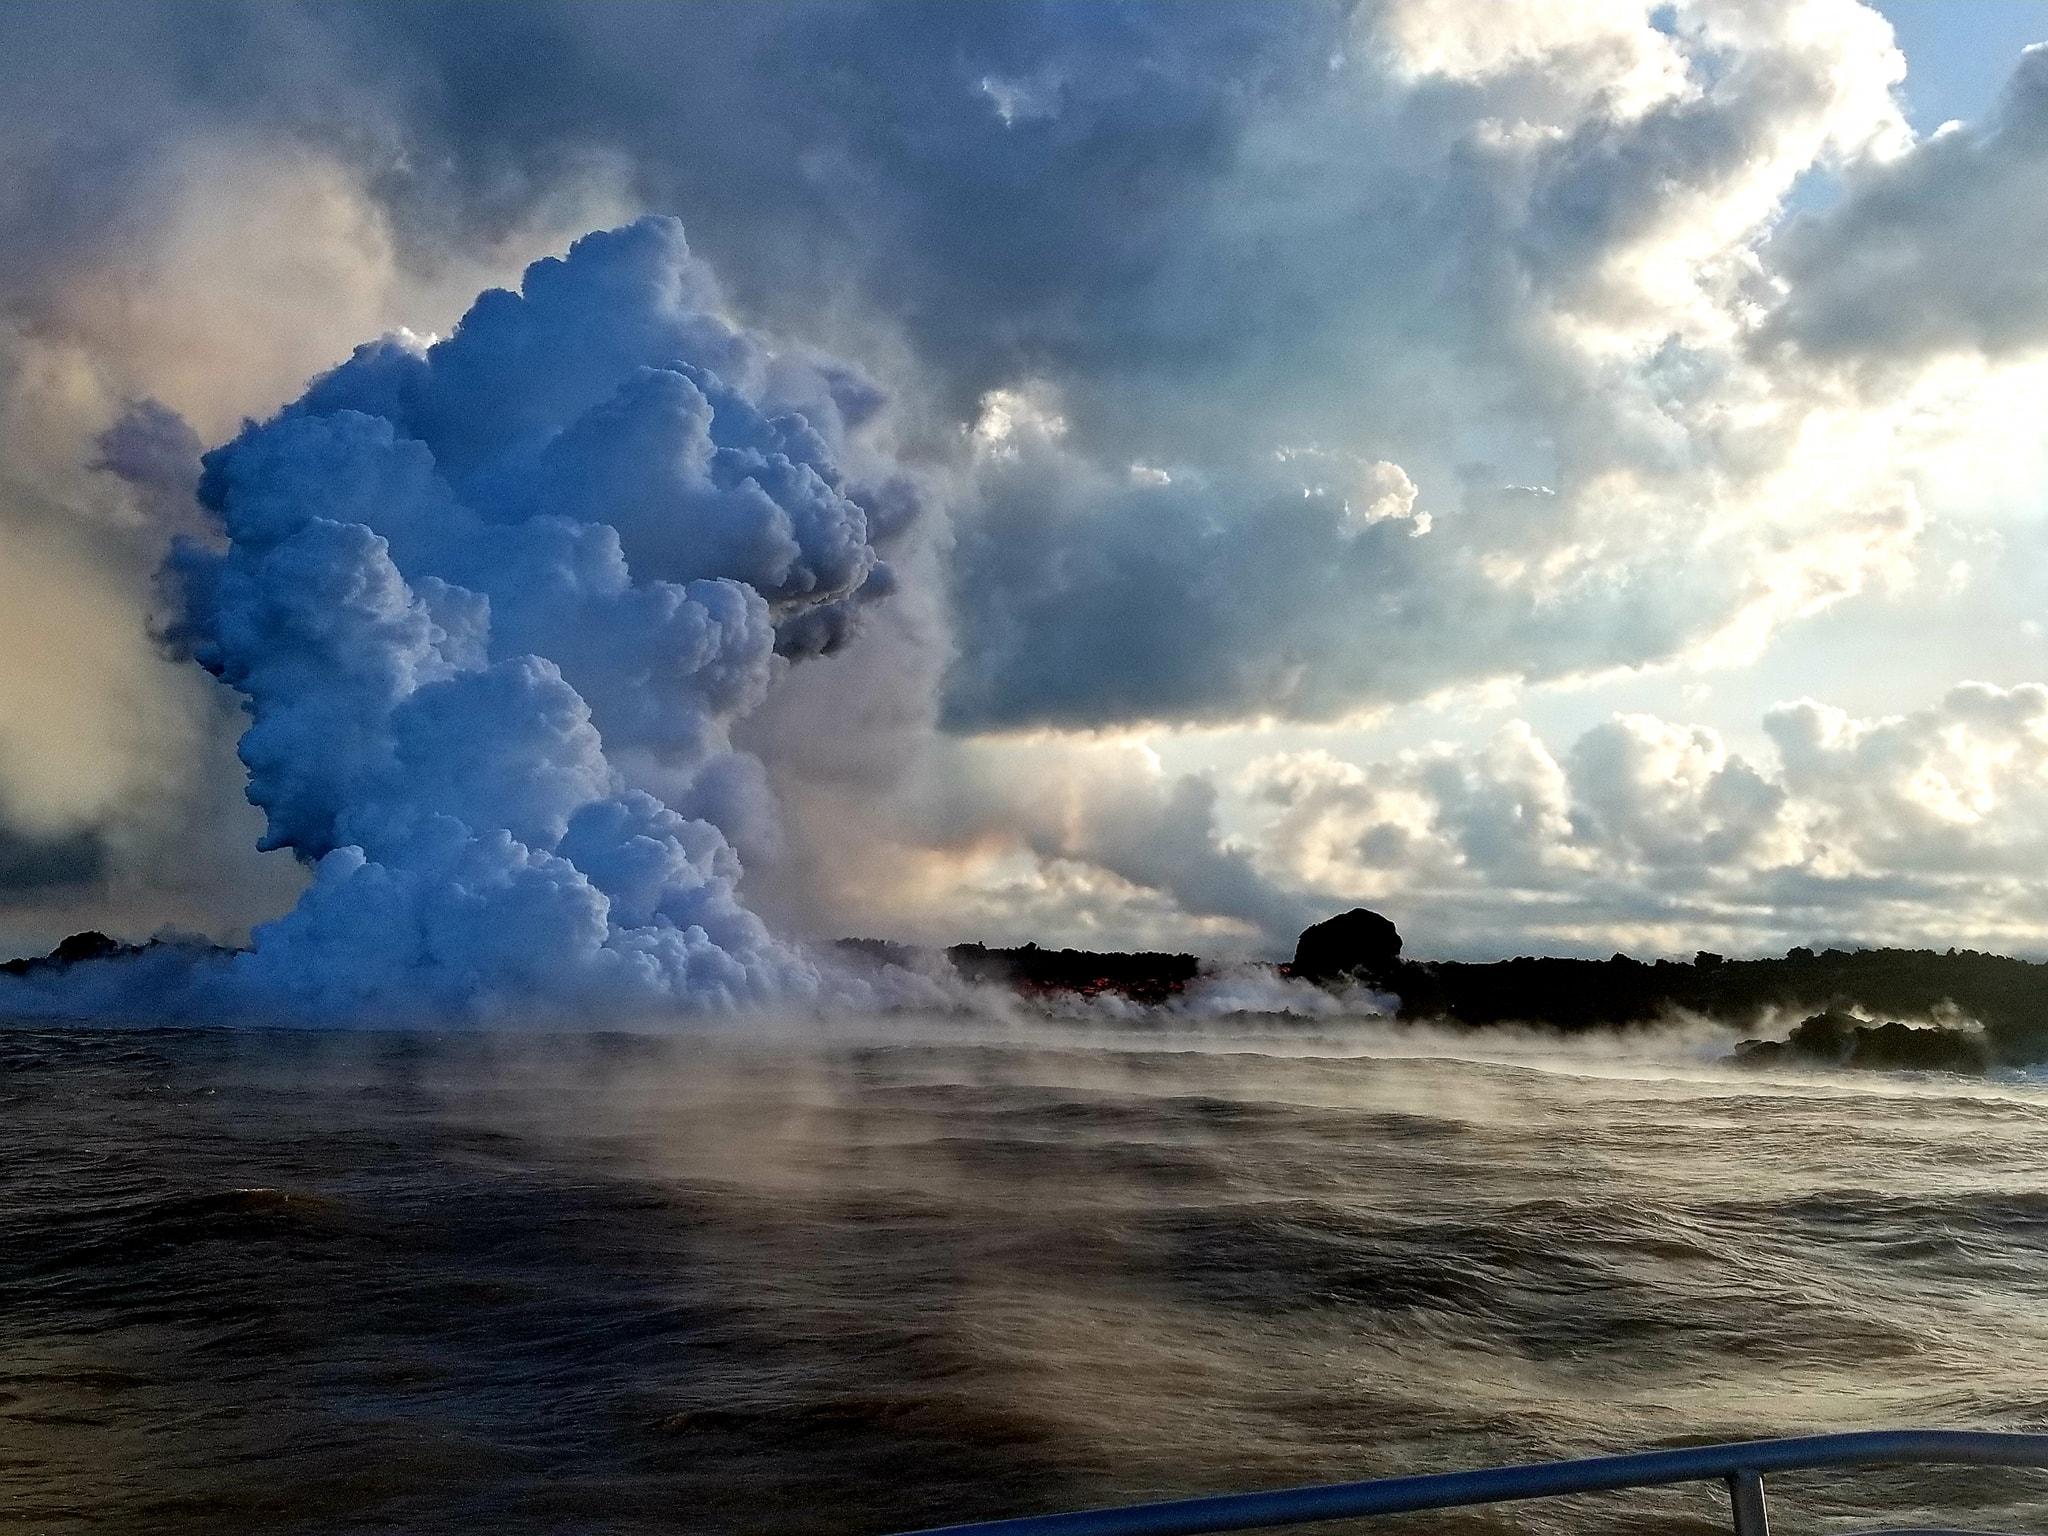 20 Juin 2018. FR. Hawai :  Pu'u 'Ō'ō / Kilauea , Colombie : Galeras , Philippines : Mayon , Kamchatka : Ebeko.